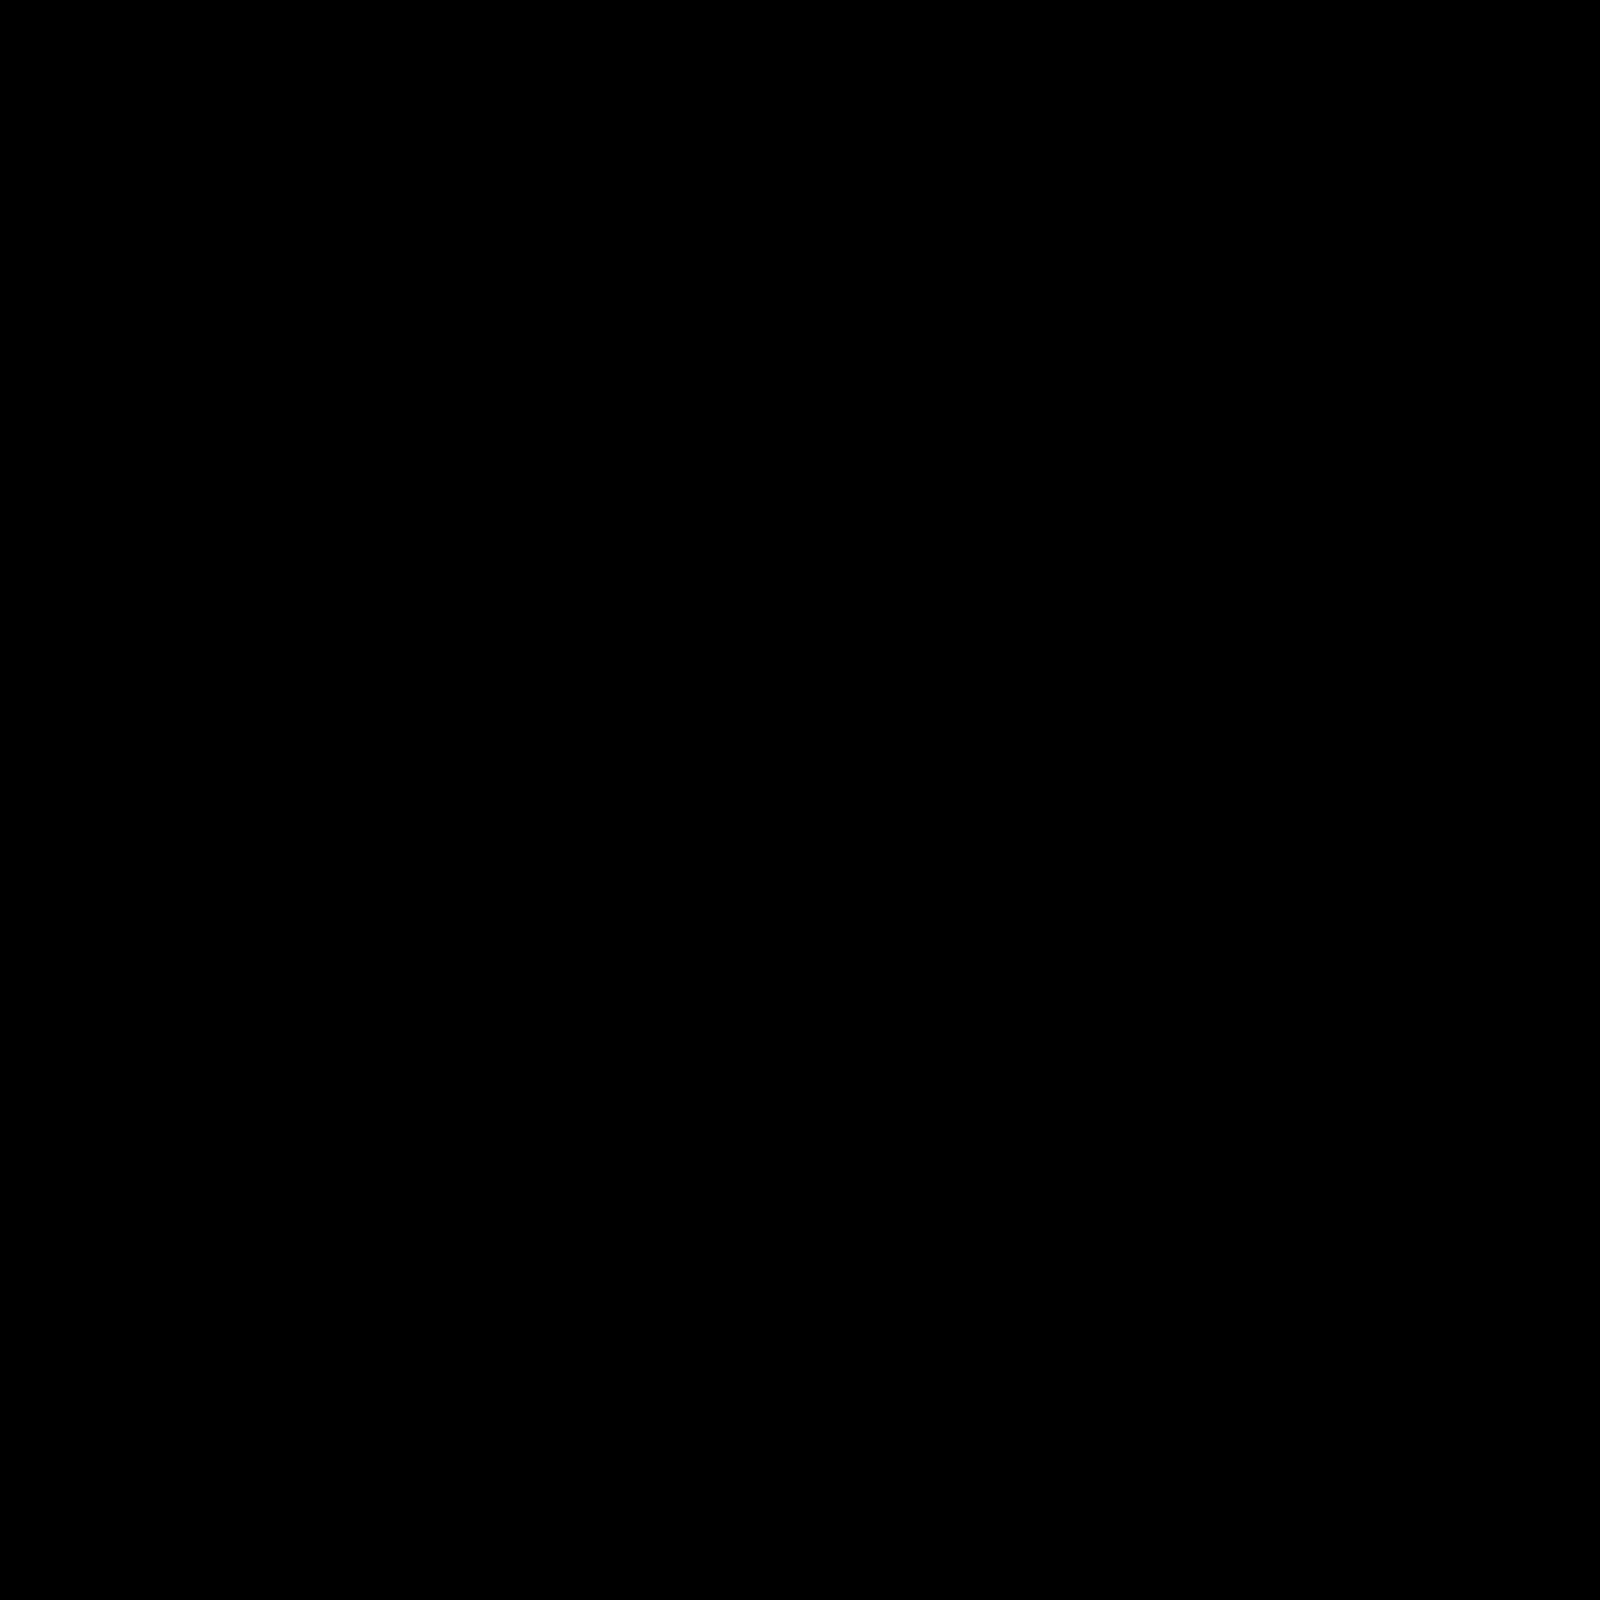 Steak Hot Filled icon